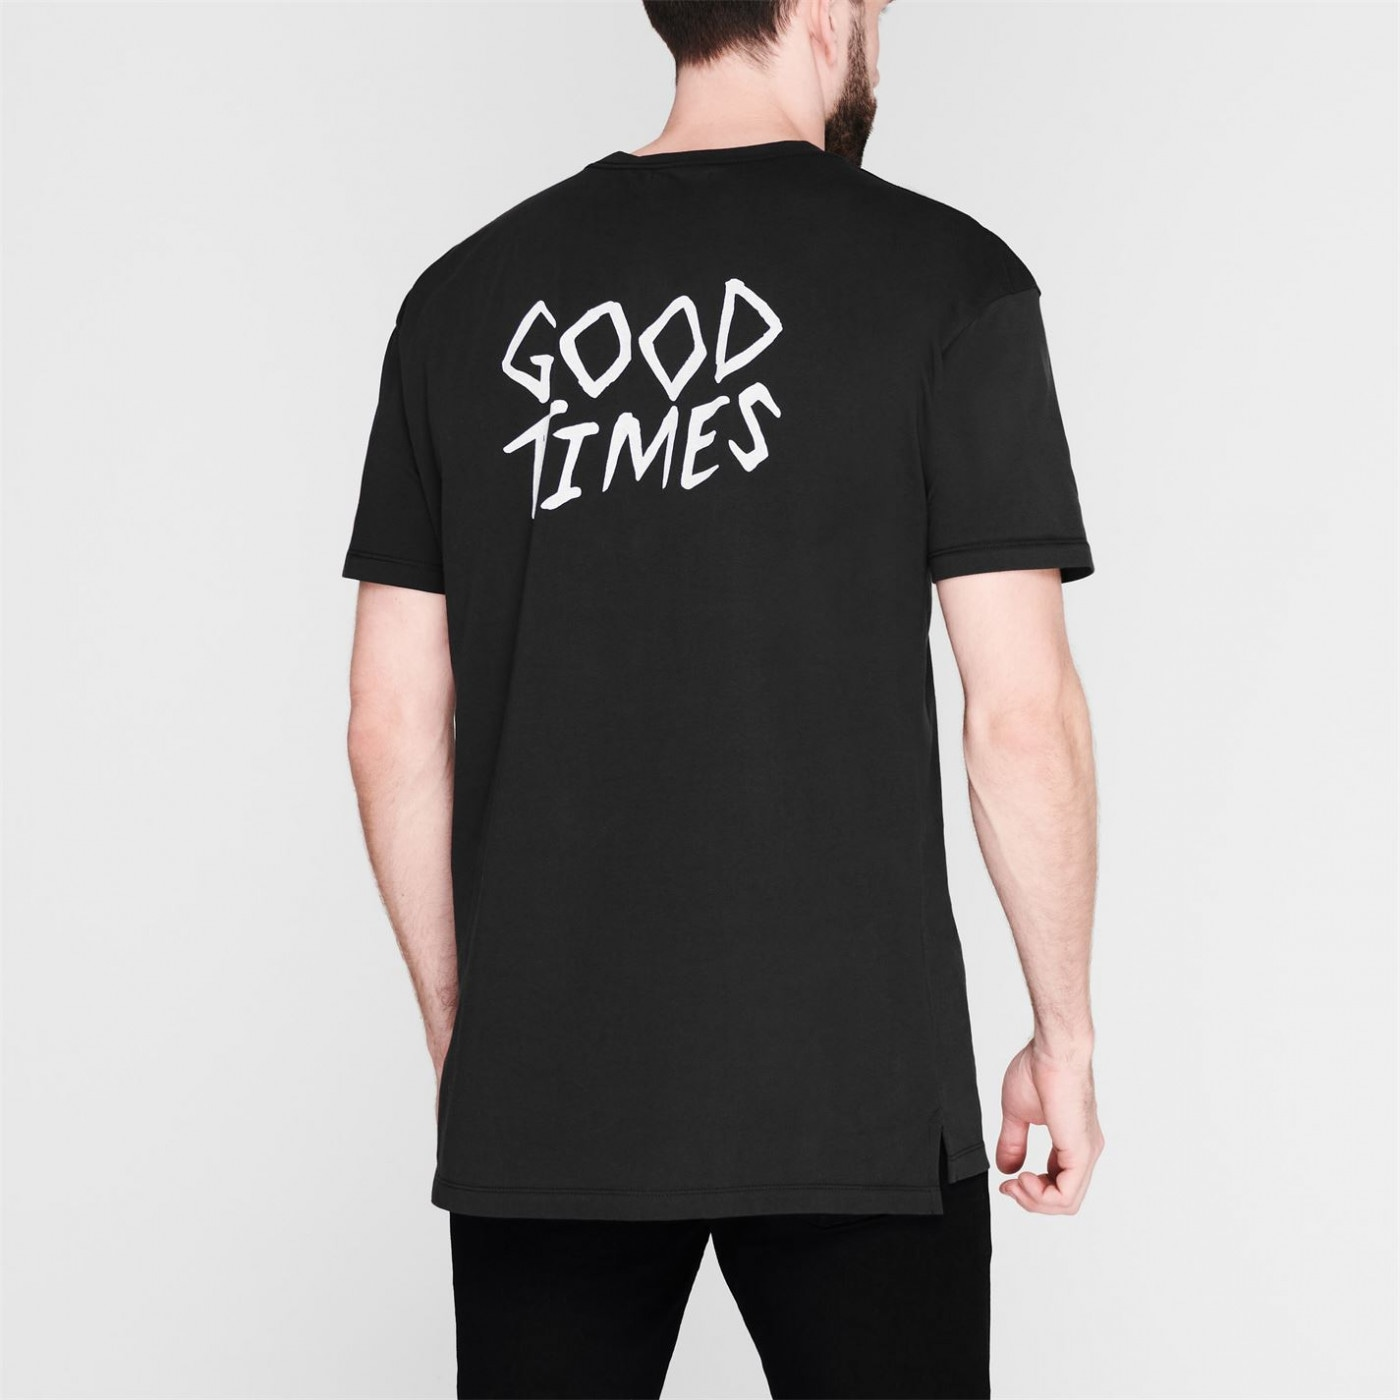 Abrand Good Times T Shirt Mens